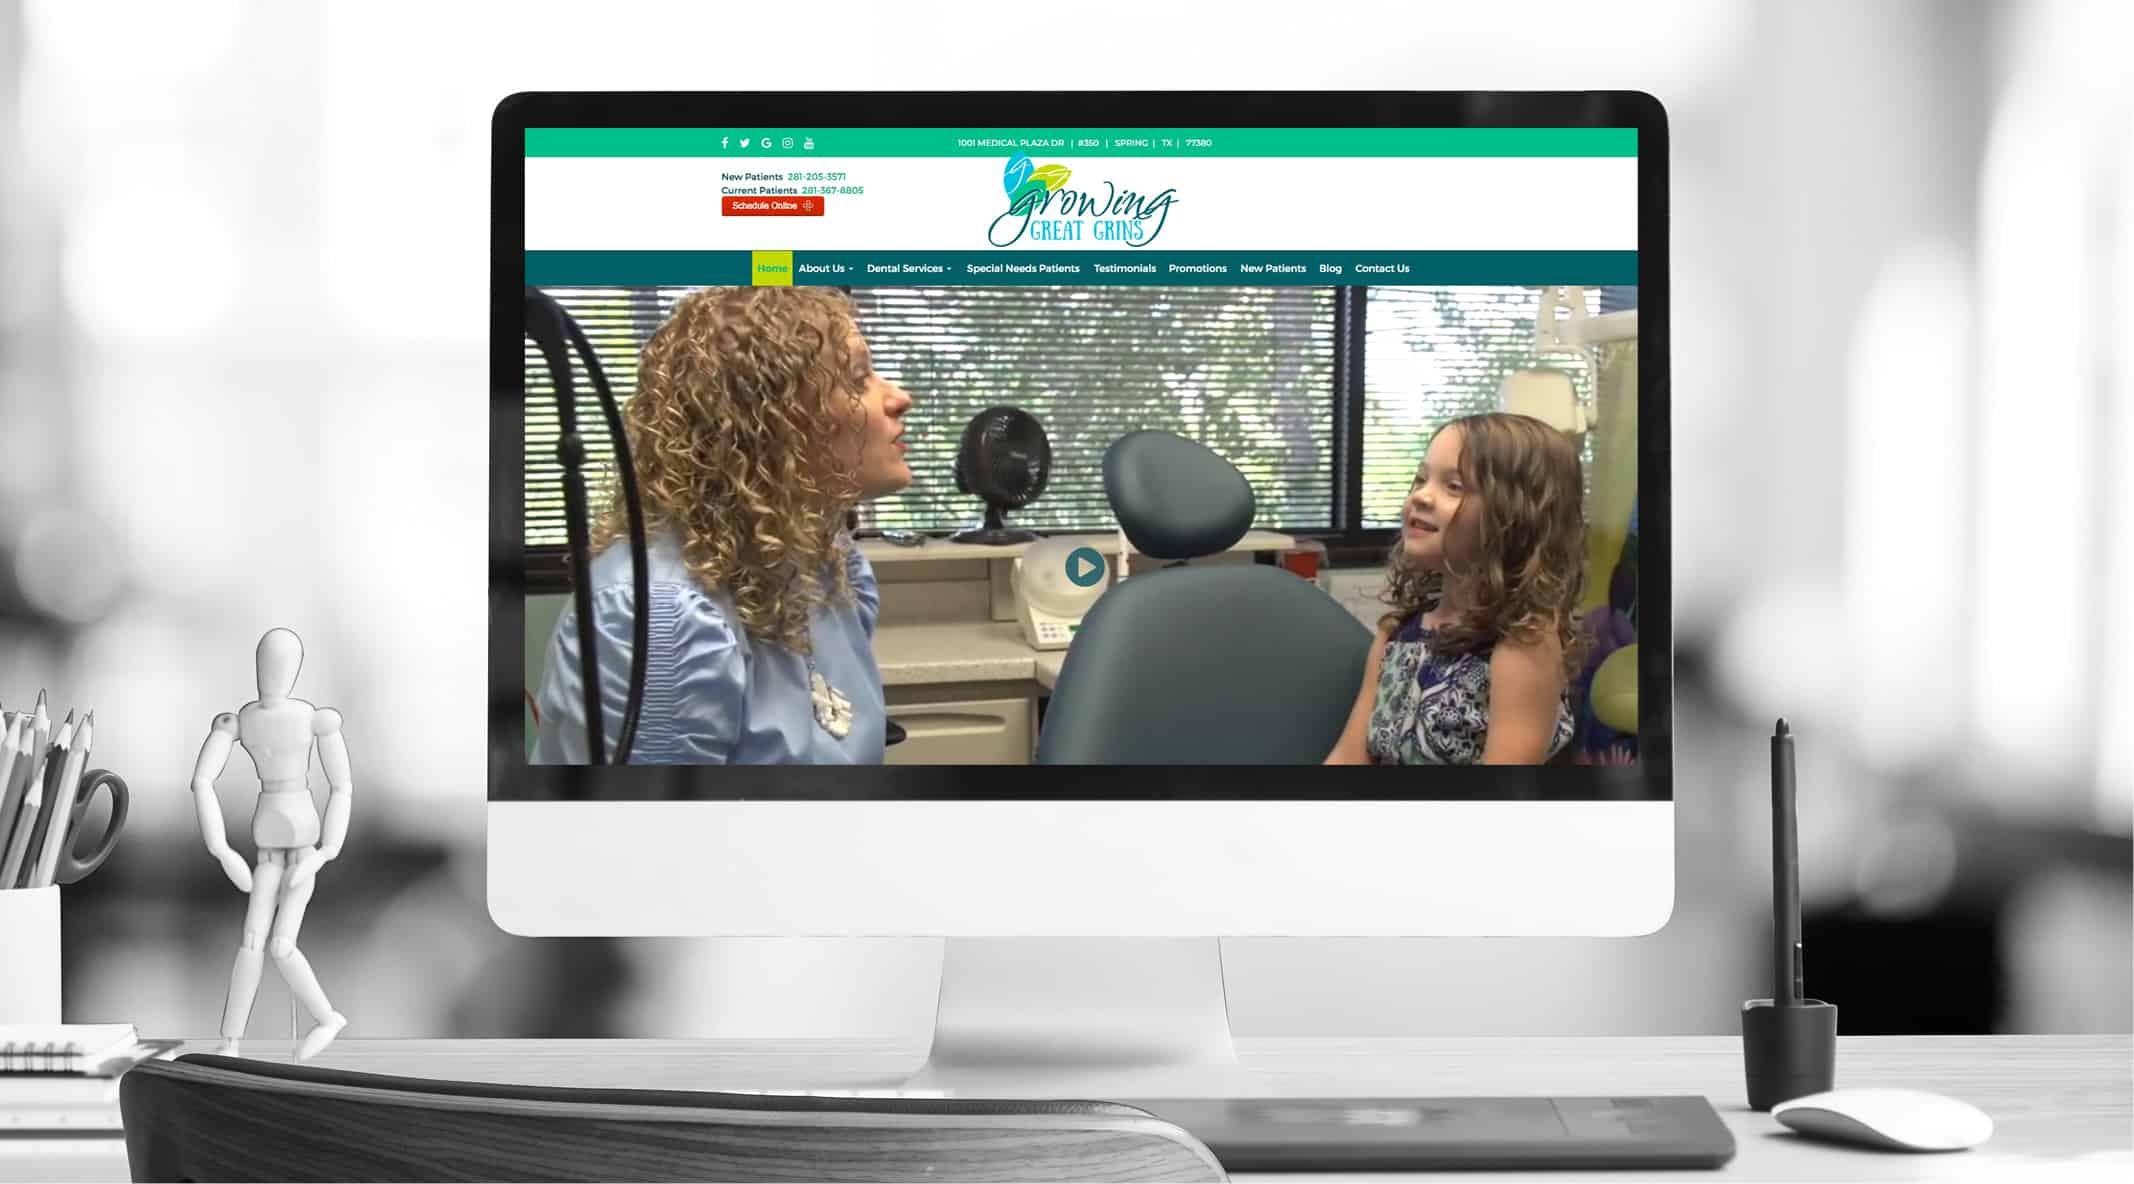 Growing Great Grins' Website